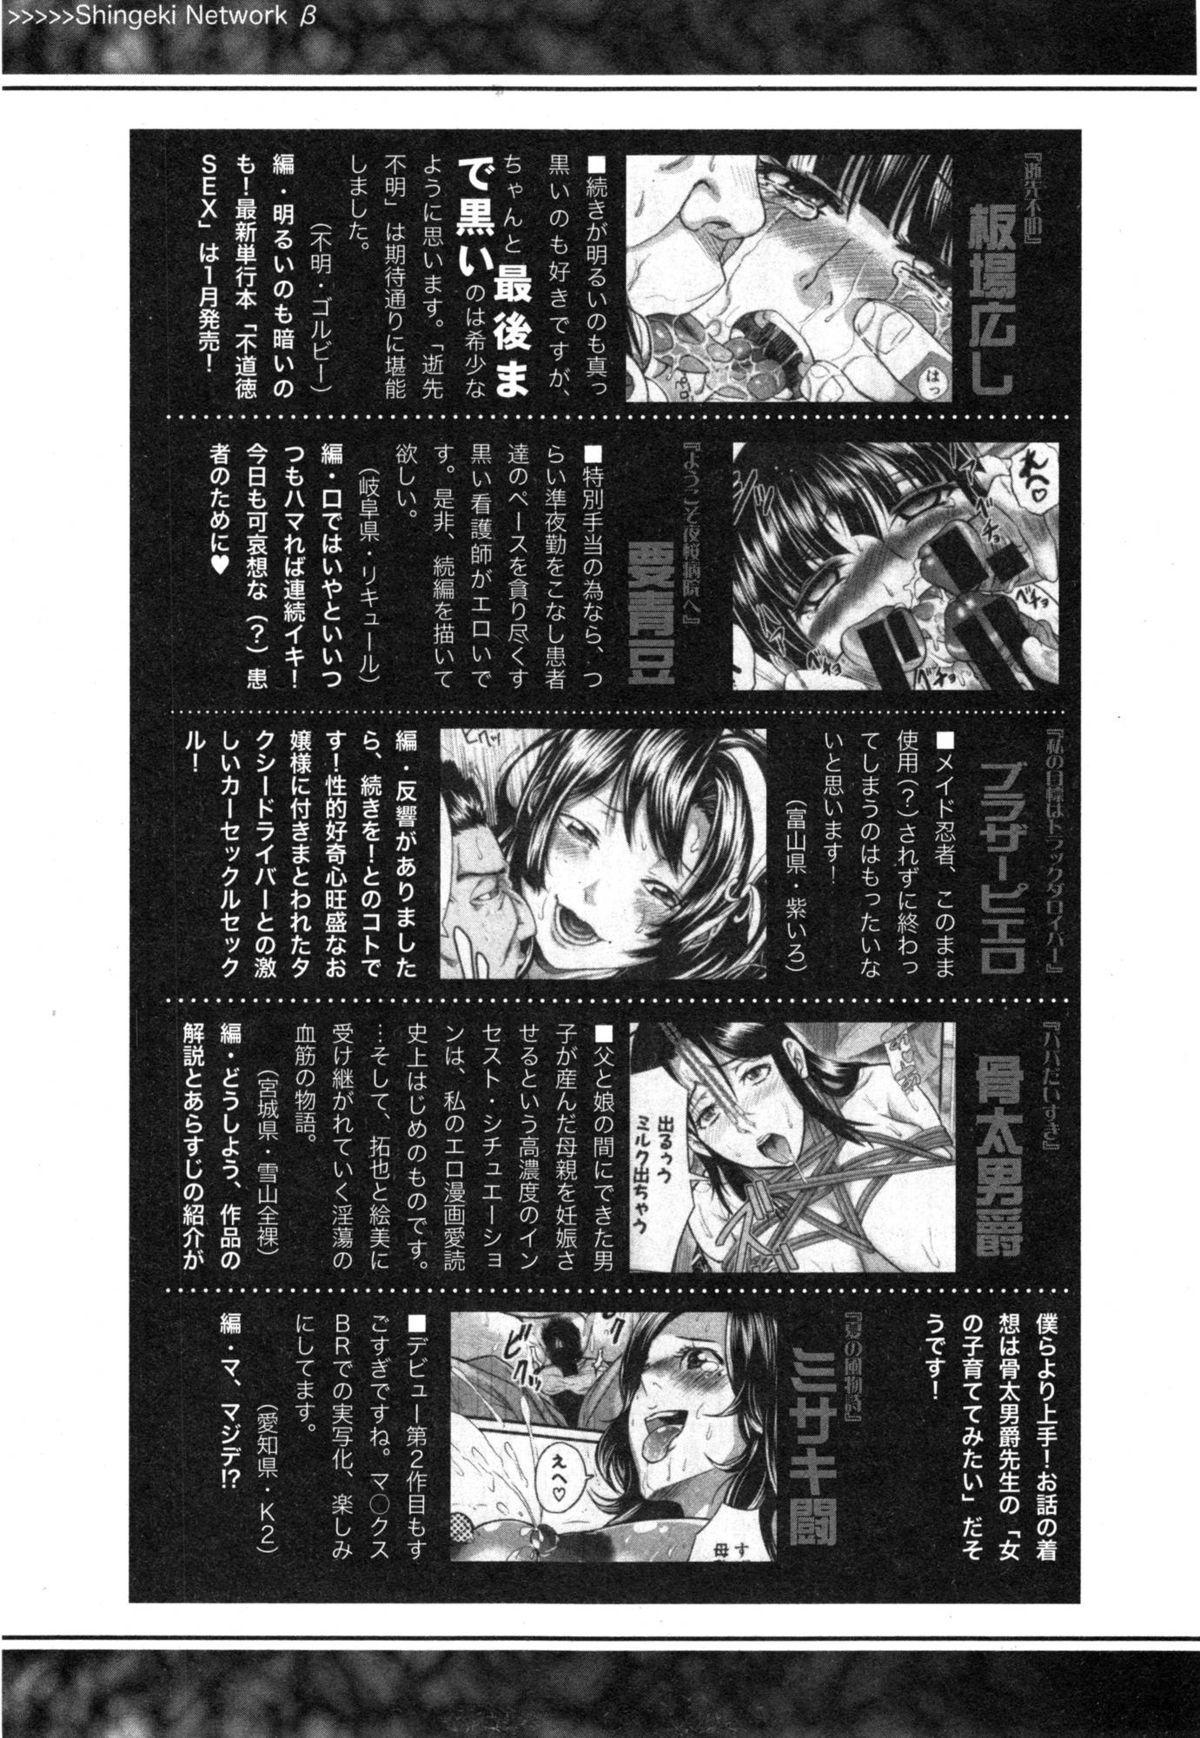 COMIC Shingeki 2015-01 354